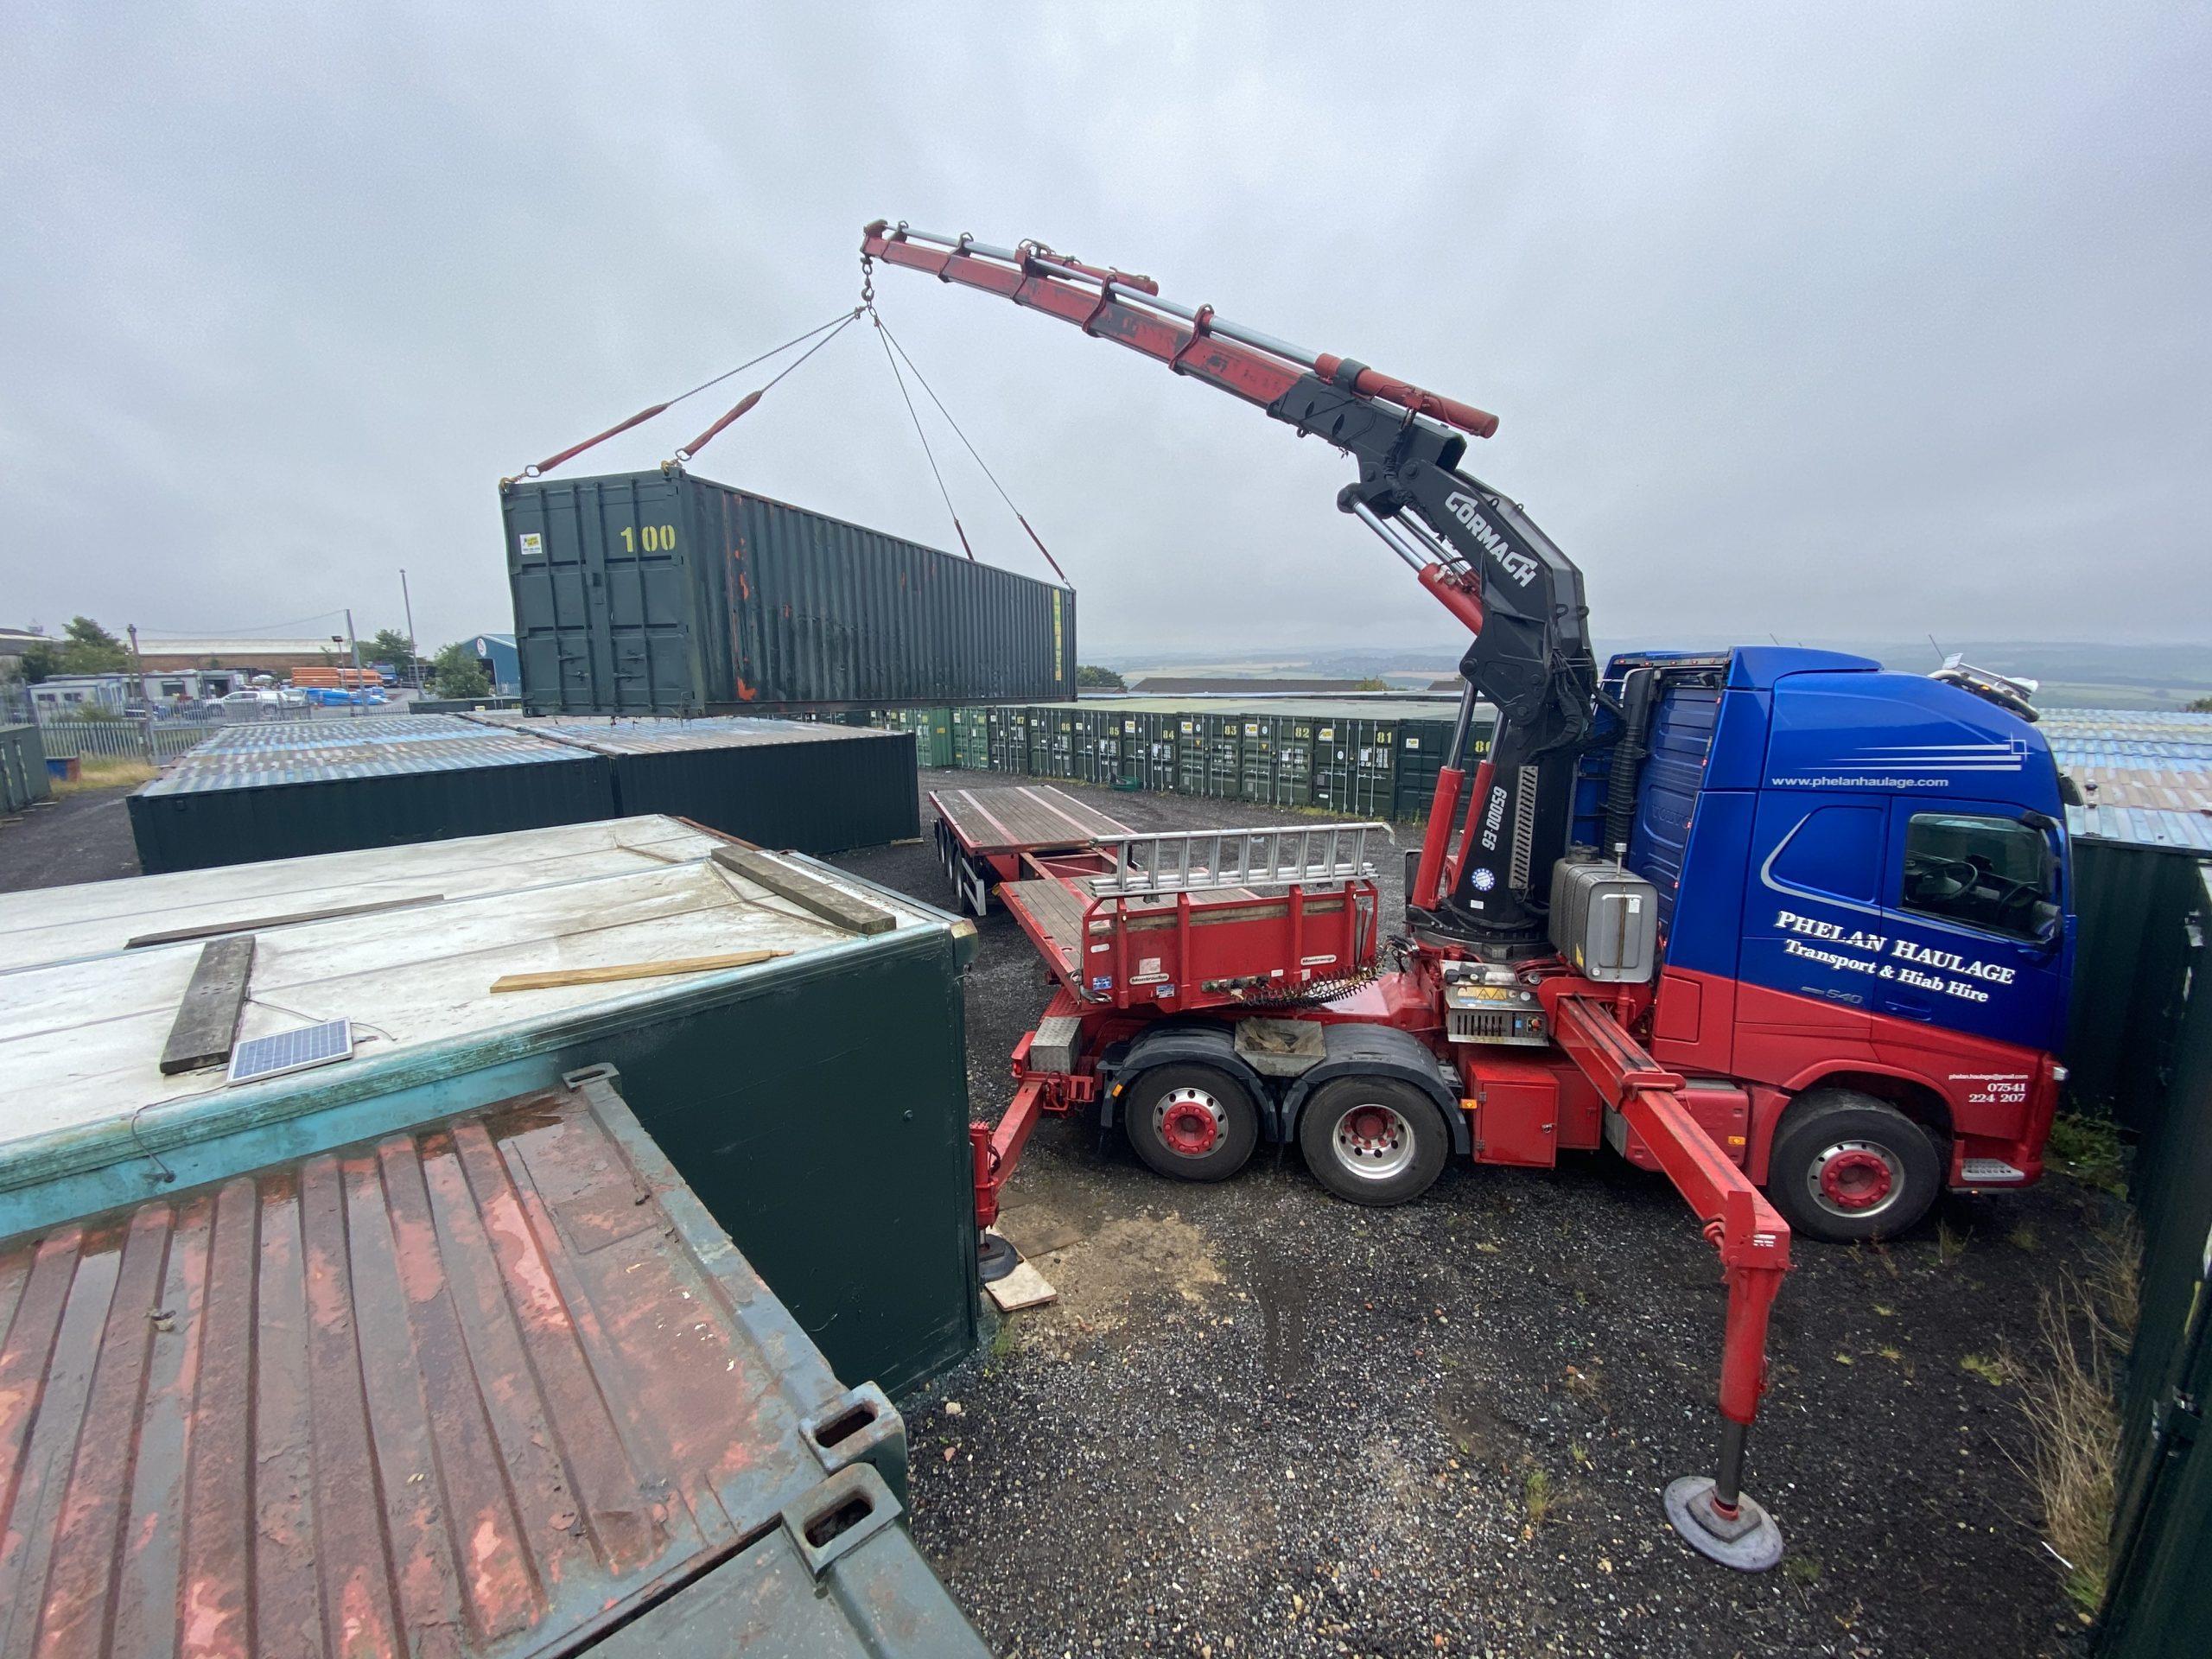 phelan_haulage_hiab_container